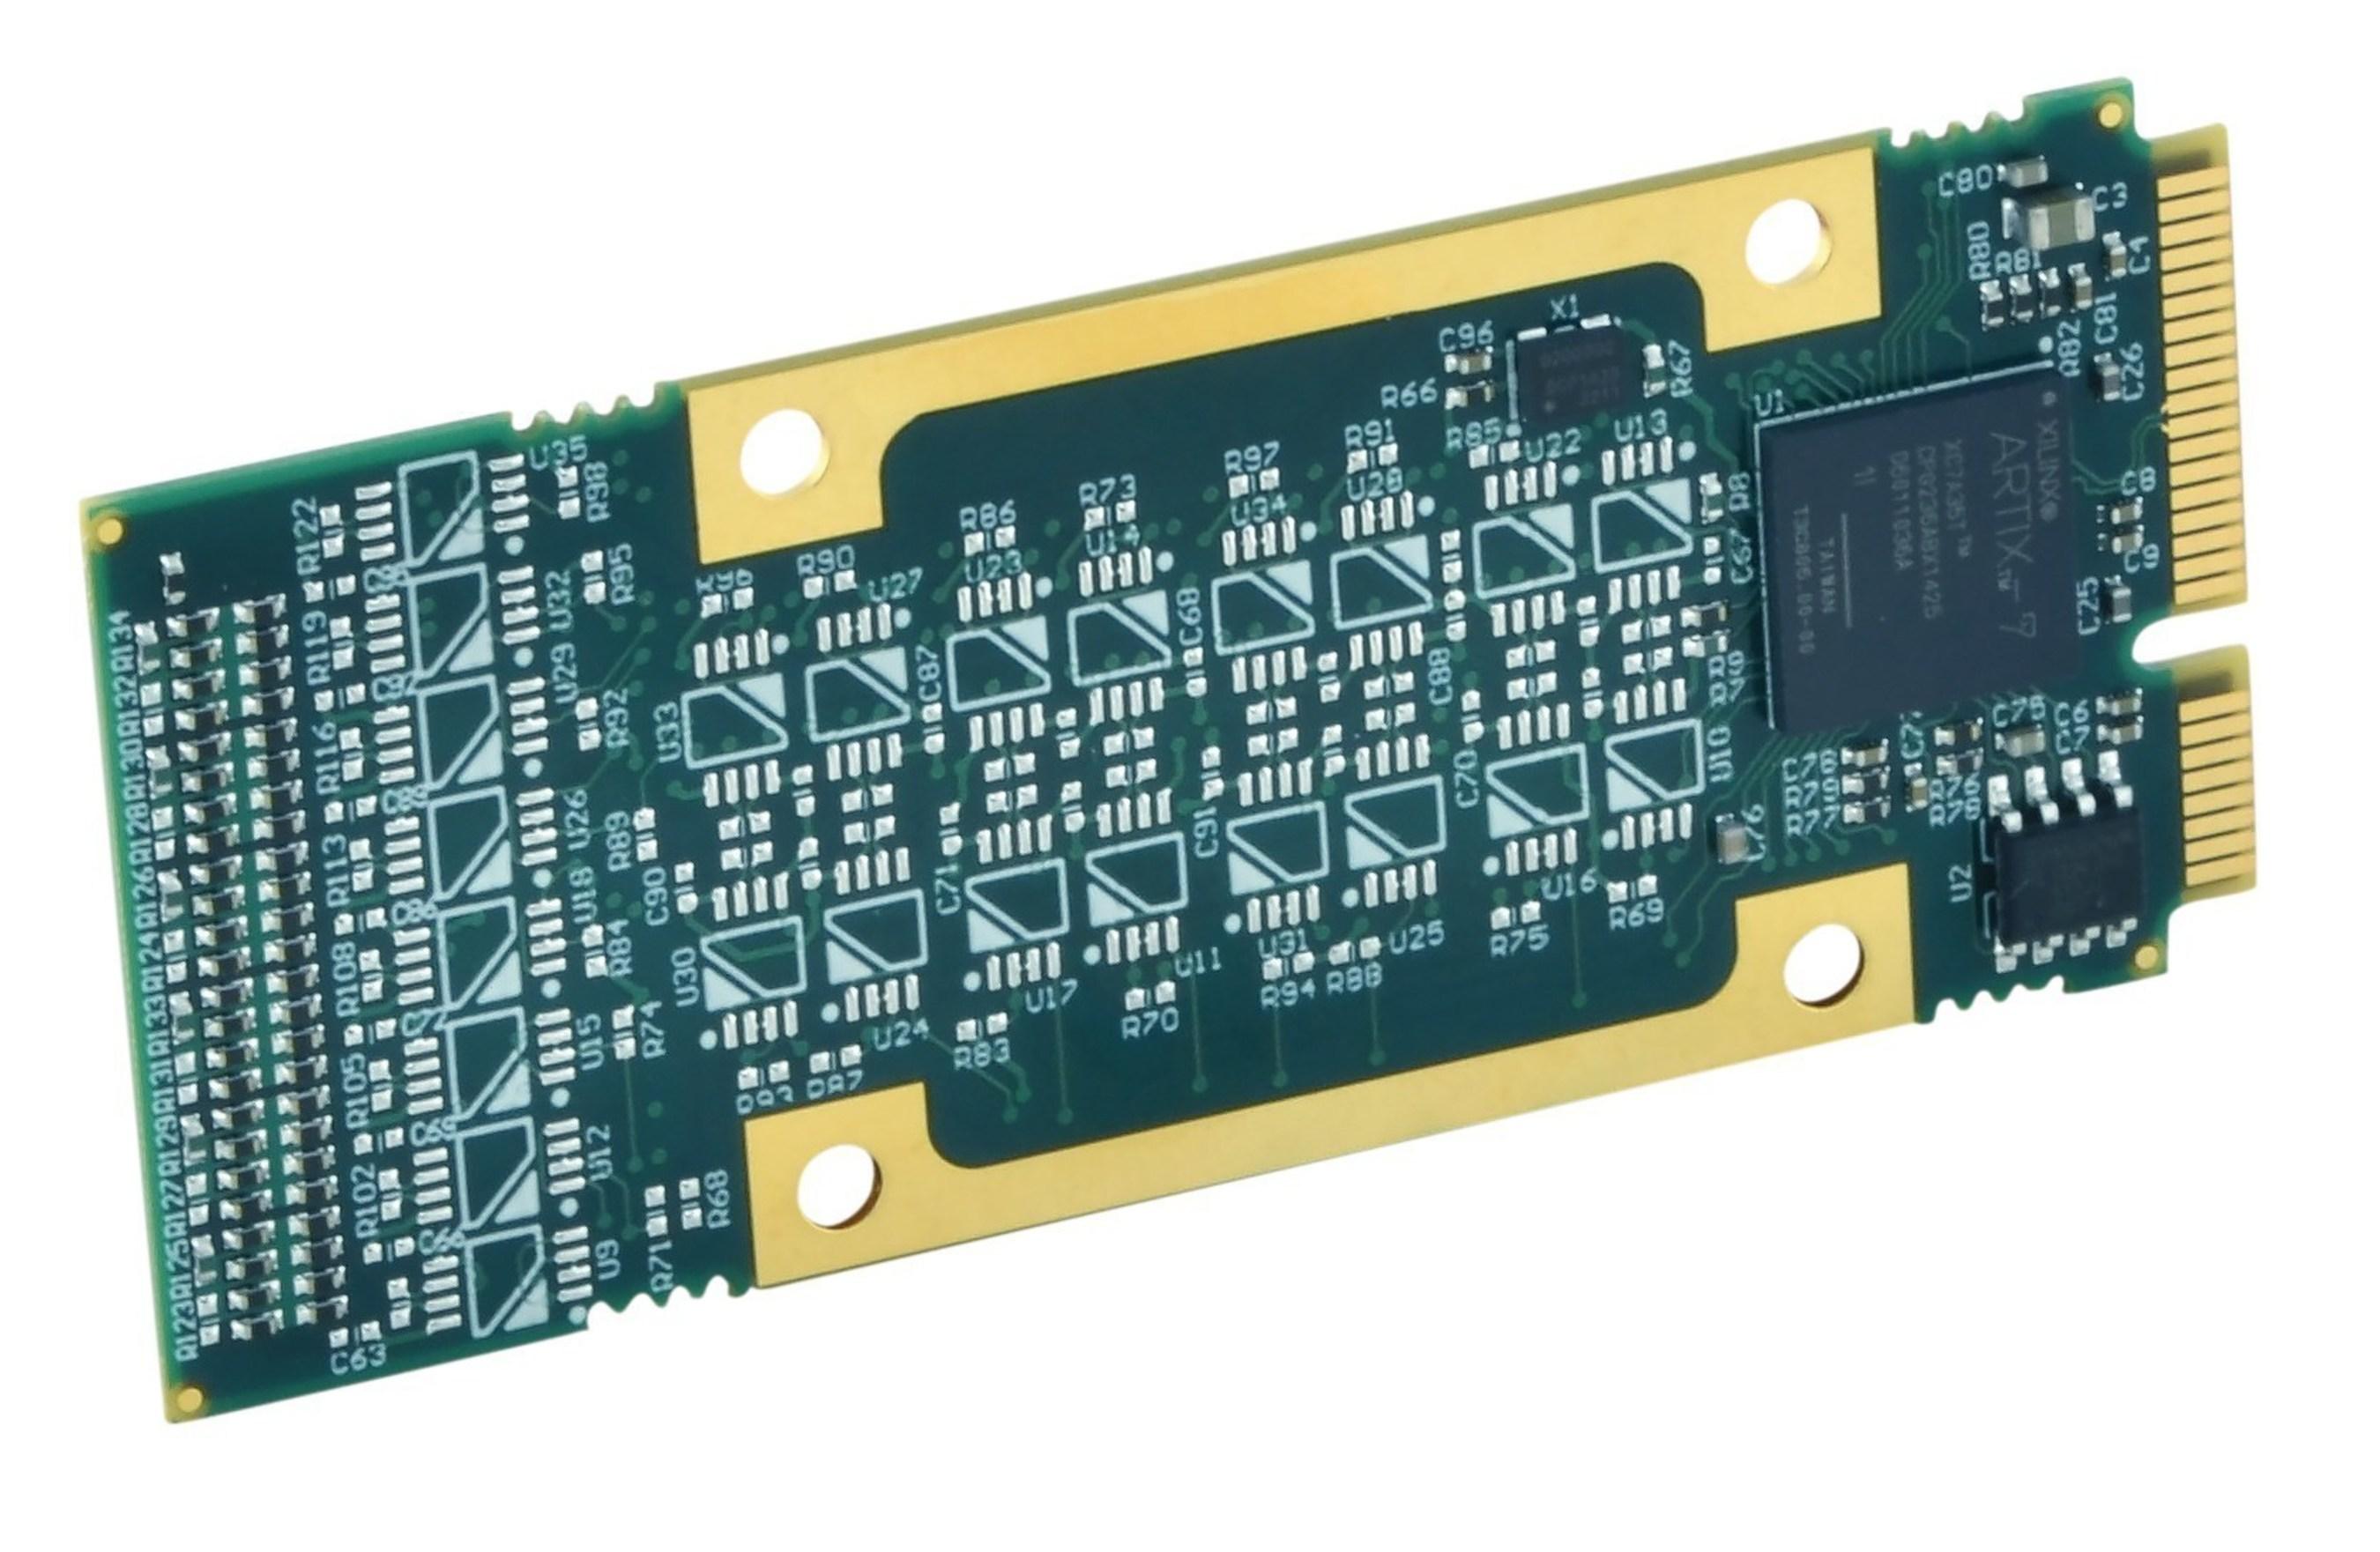 Acromag's New AcroPack I/O Platform adds a Reconfigurable Xilinx' Artix'-7 FPGA for Custom Computing Applications